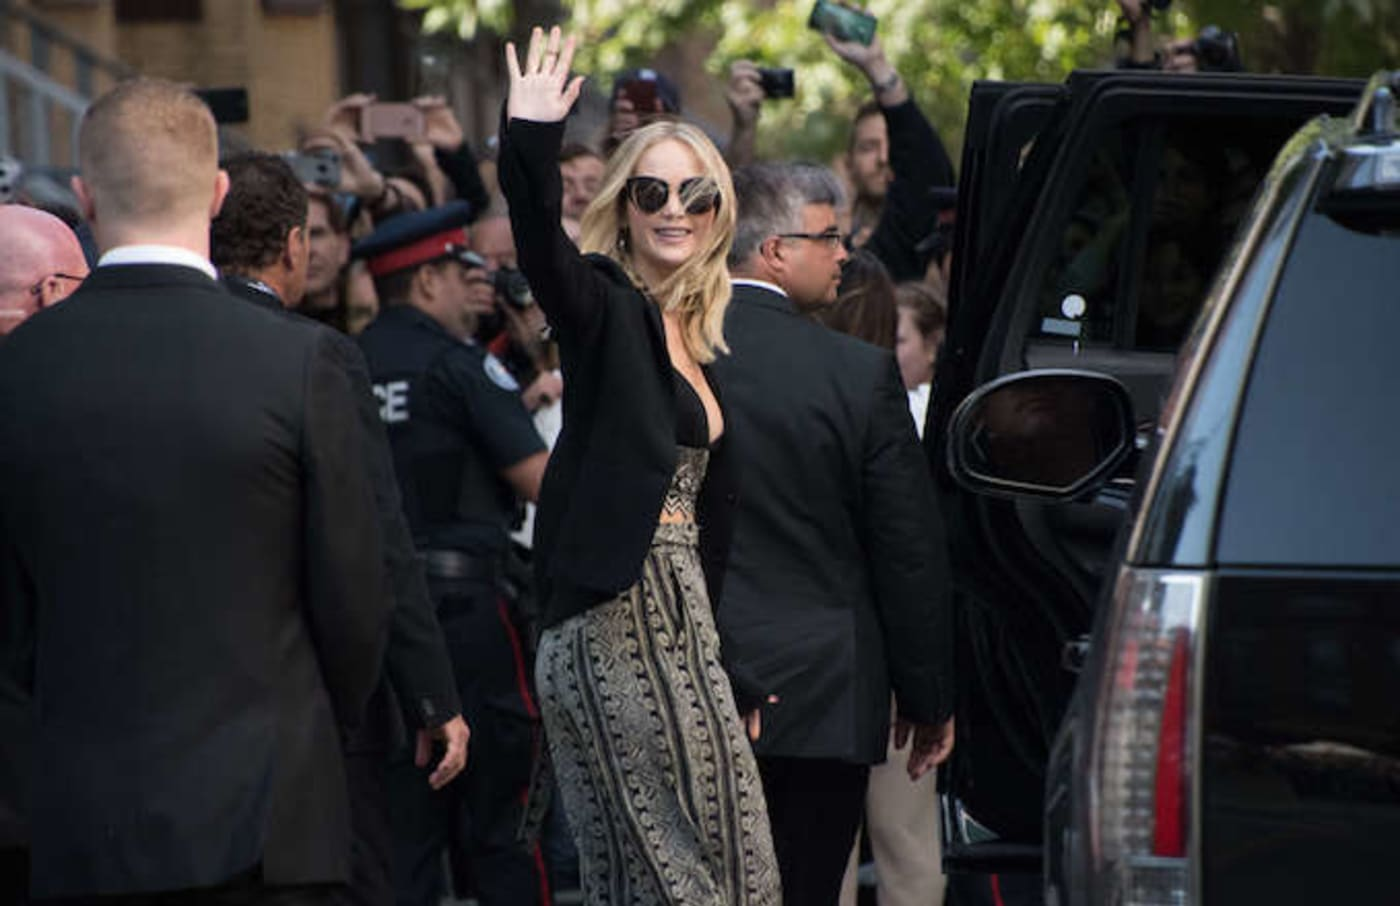 Jennifer Lawrence waving